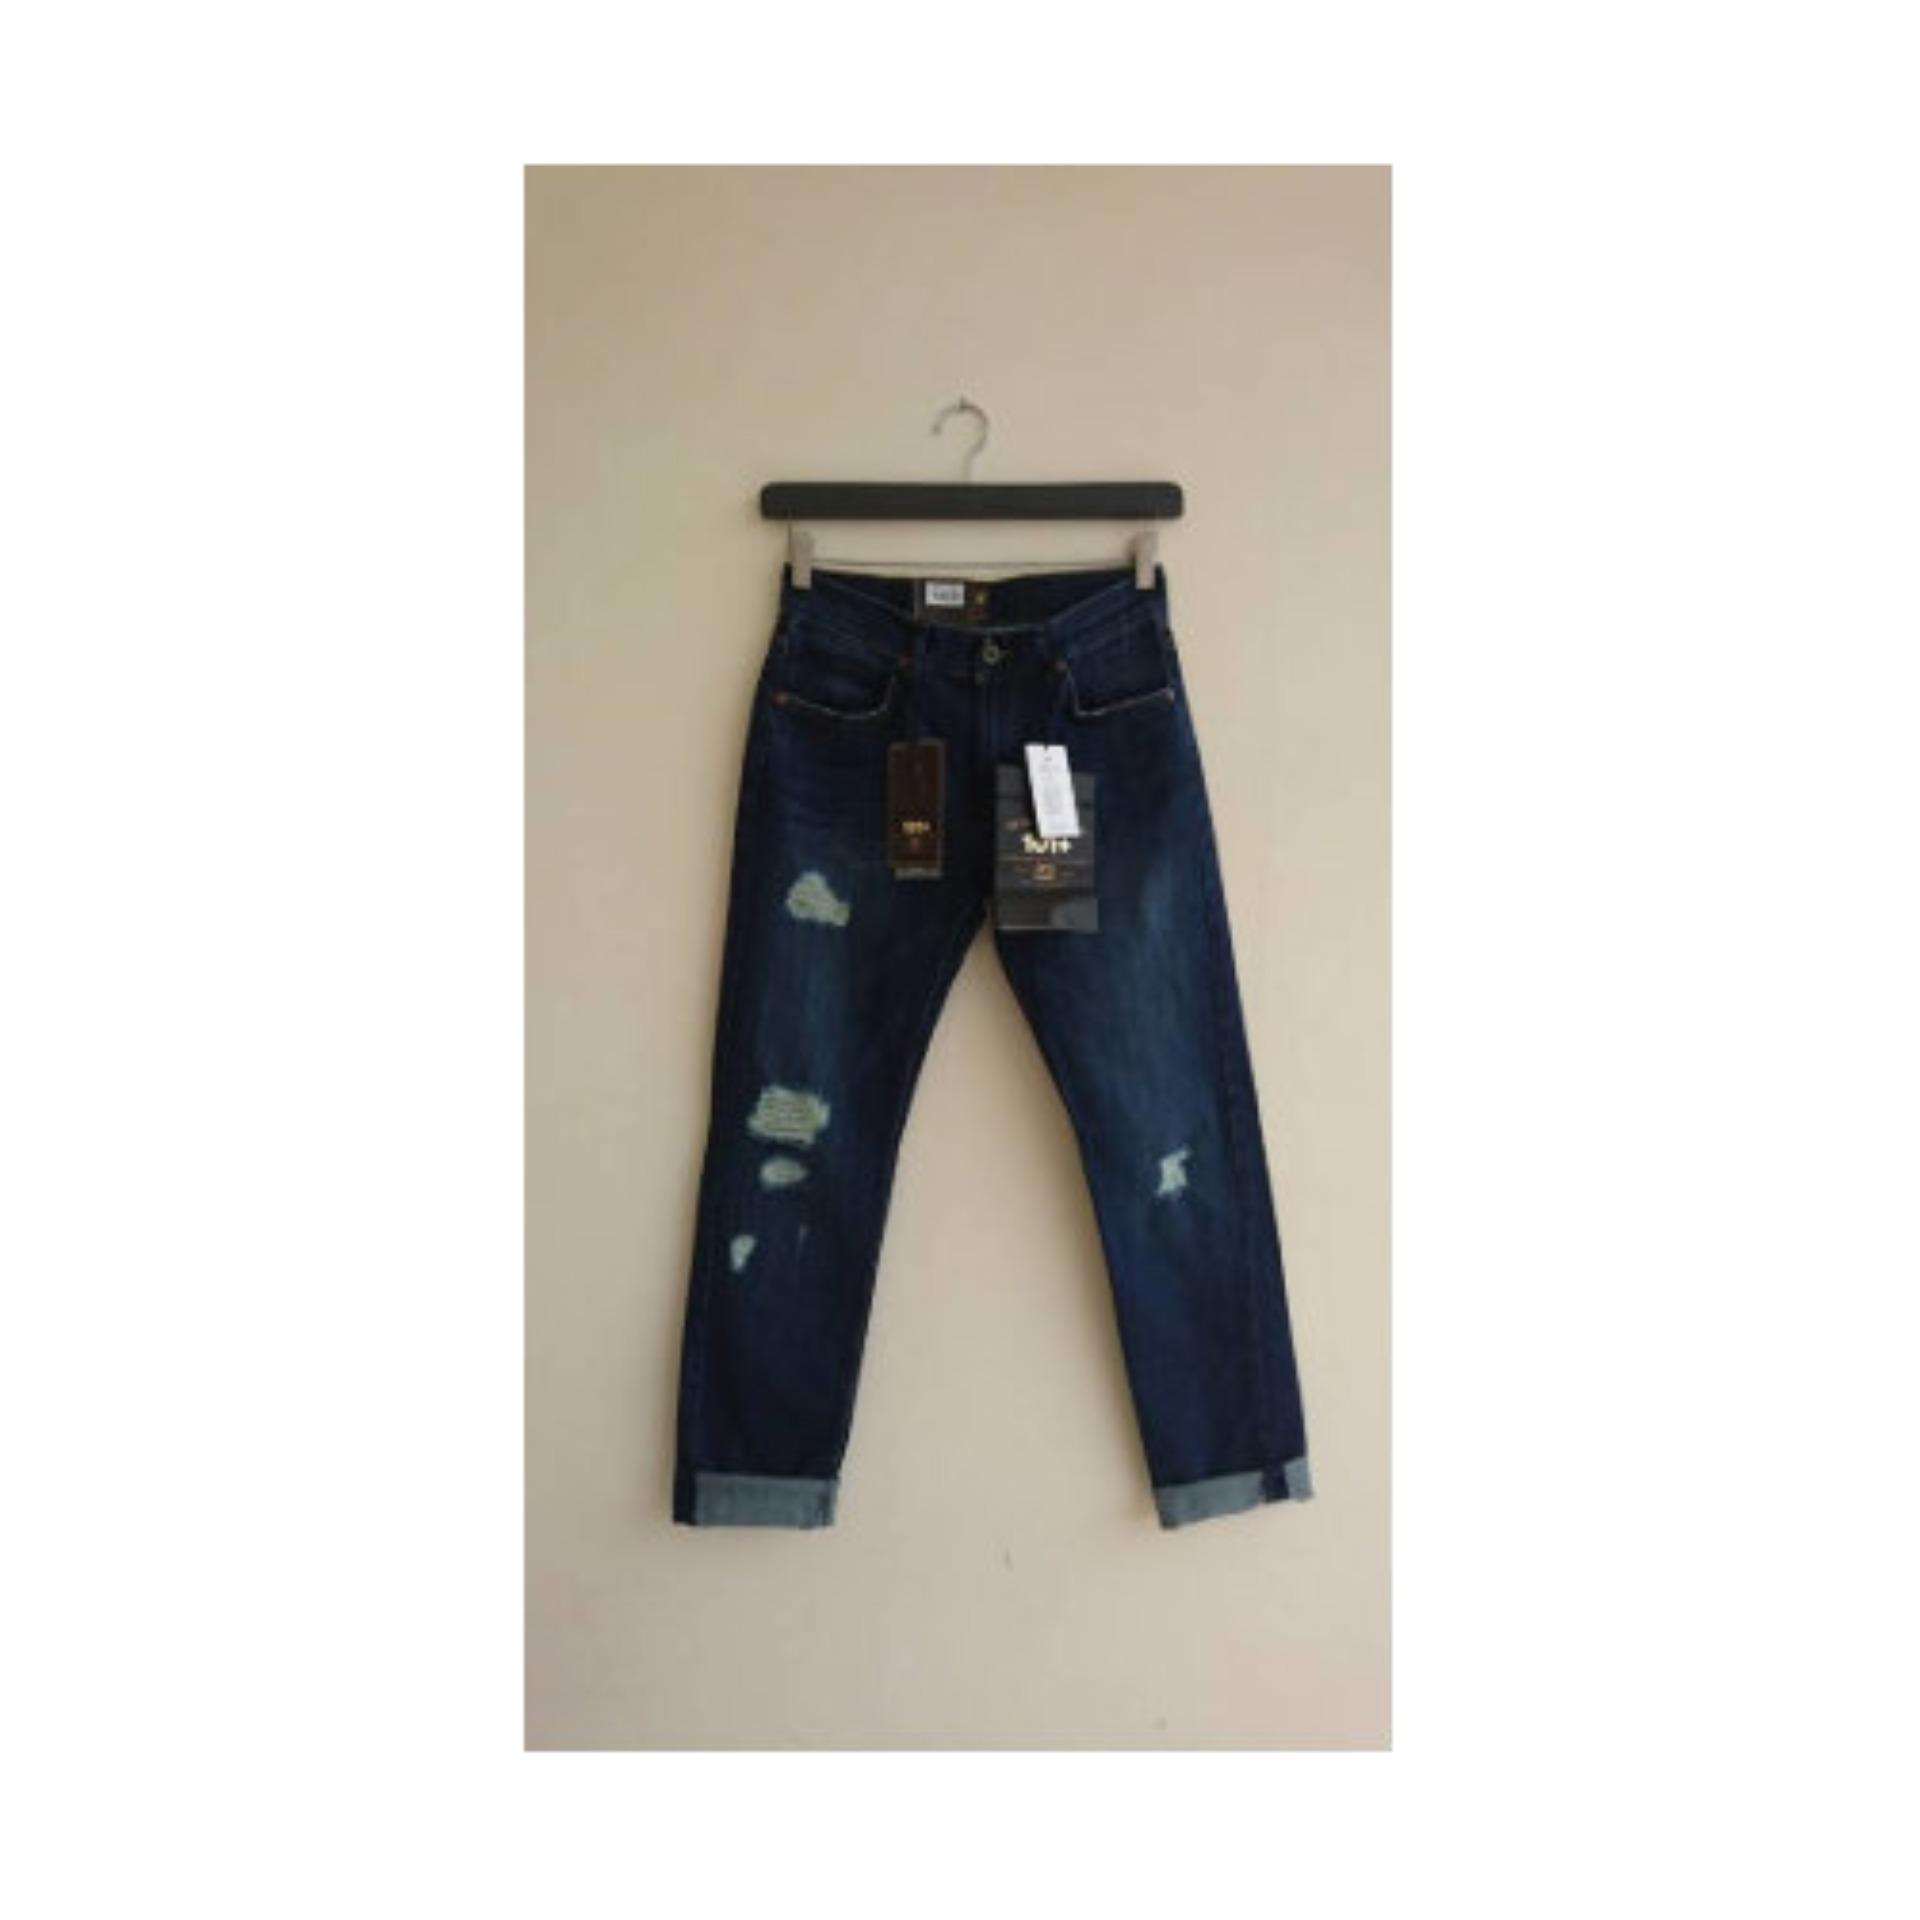 promo harga Terbaru Jeans Lee Conti Terbaik Oktober 2018  3b715326aa